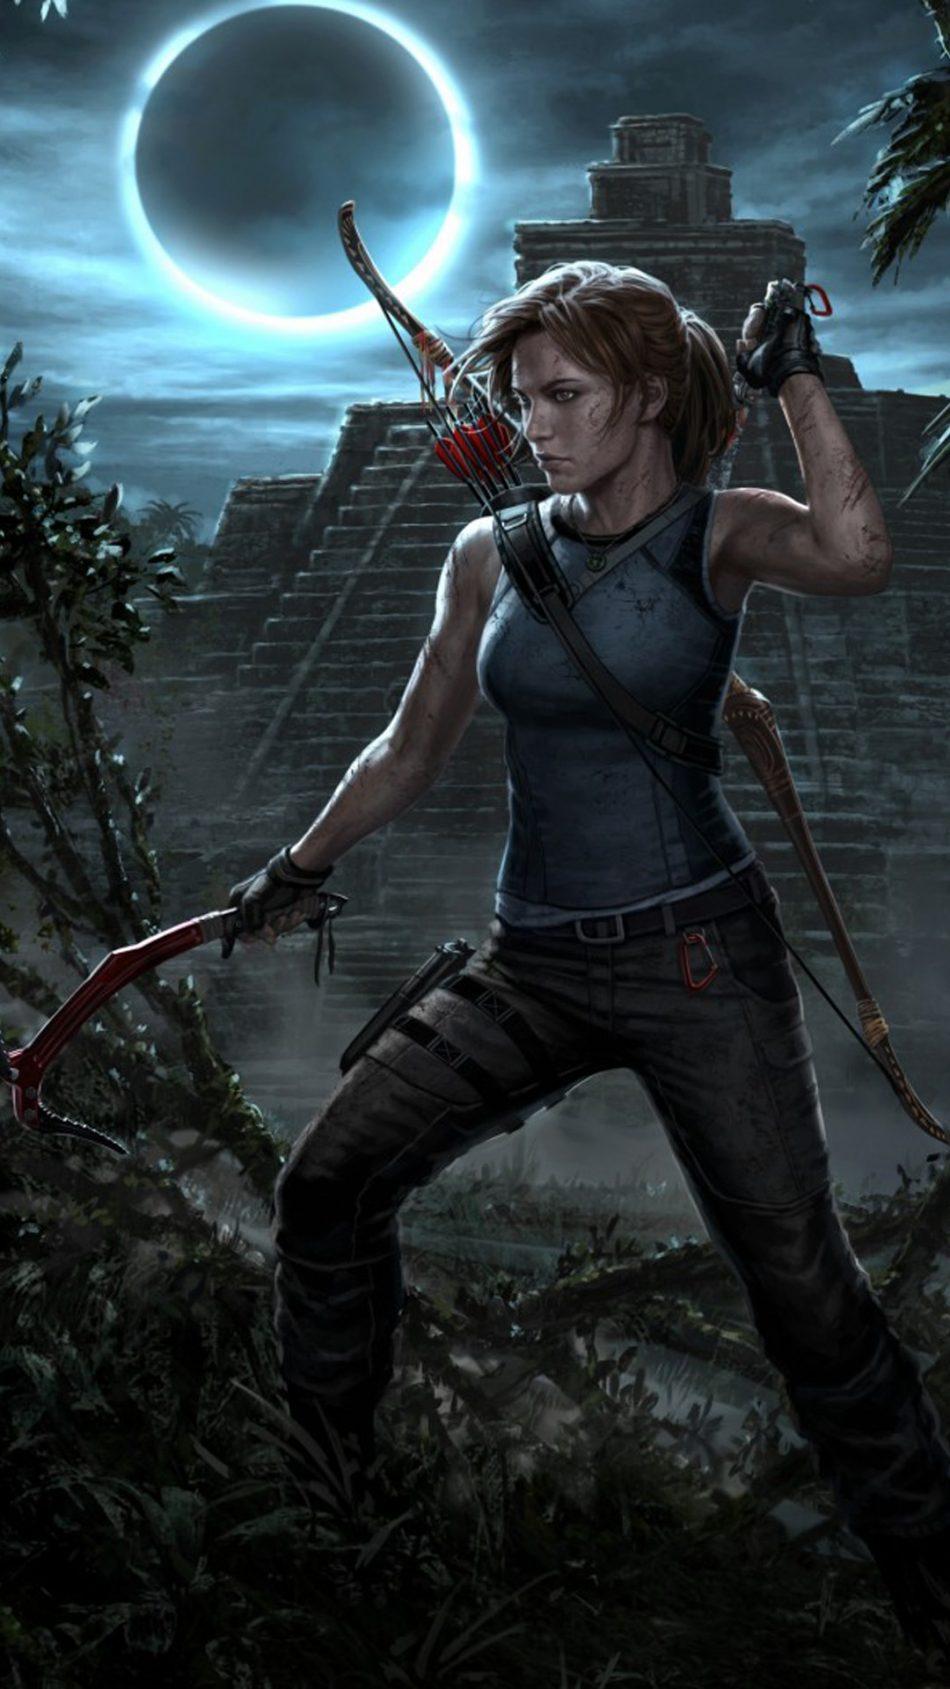 Lara Crof Shadow Of The Tomb Raider Ps 4 4k Ultra Hd Mobile Wallpaper